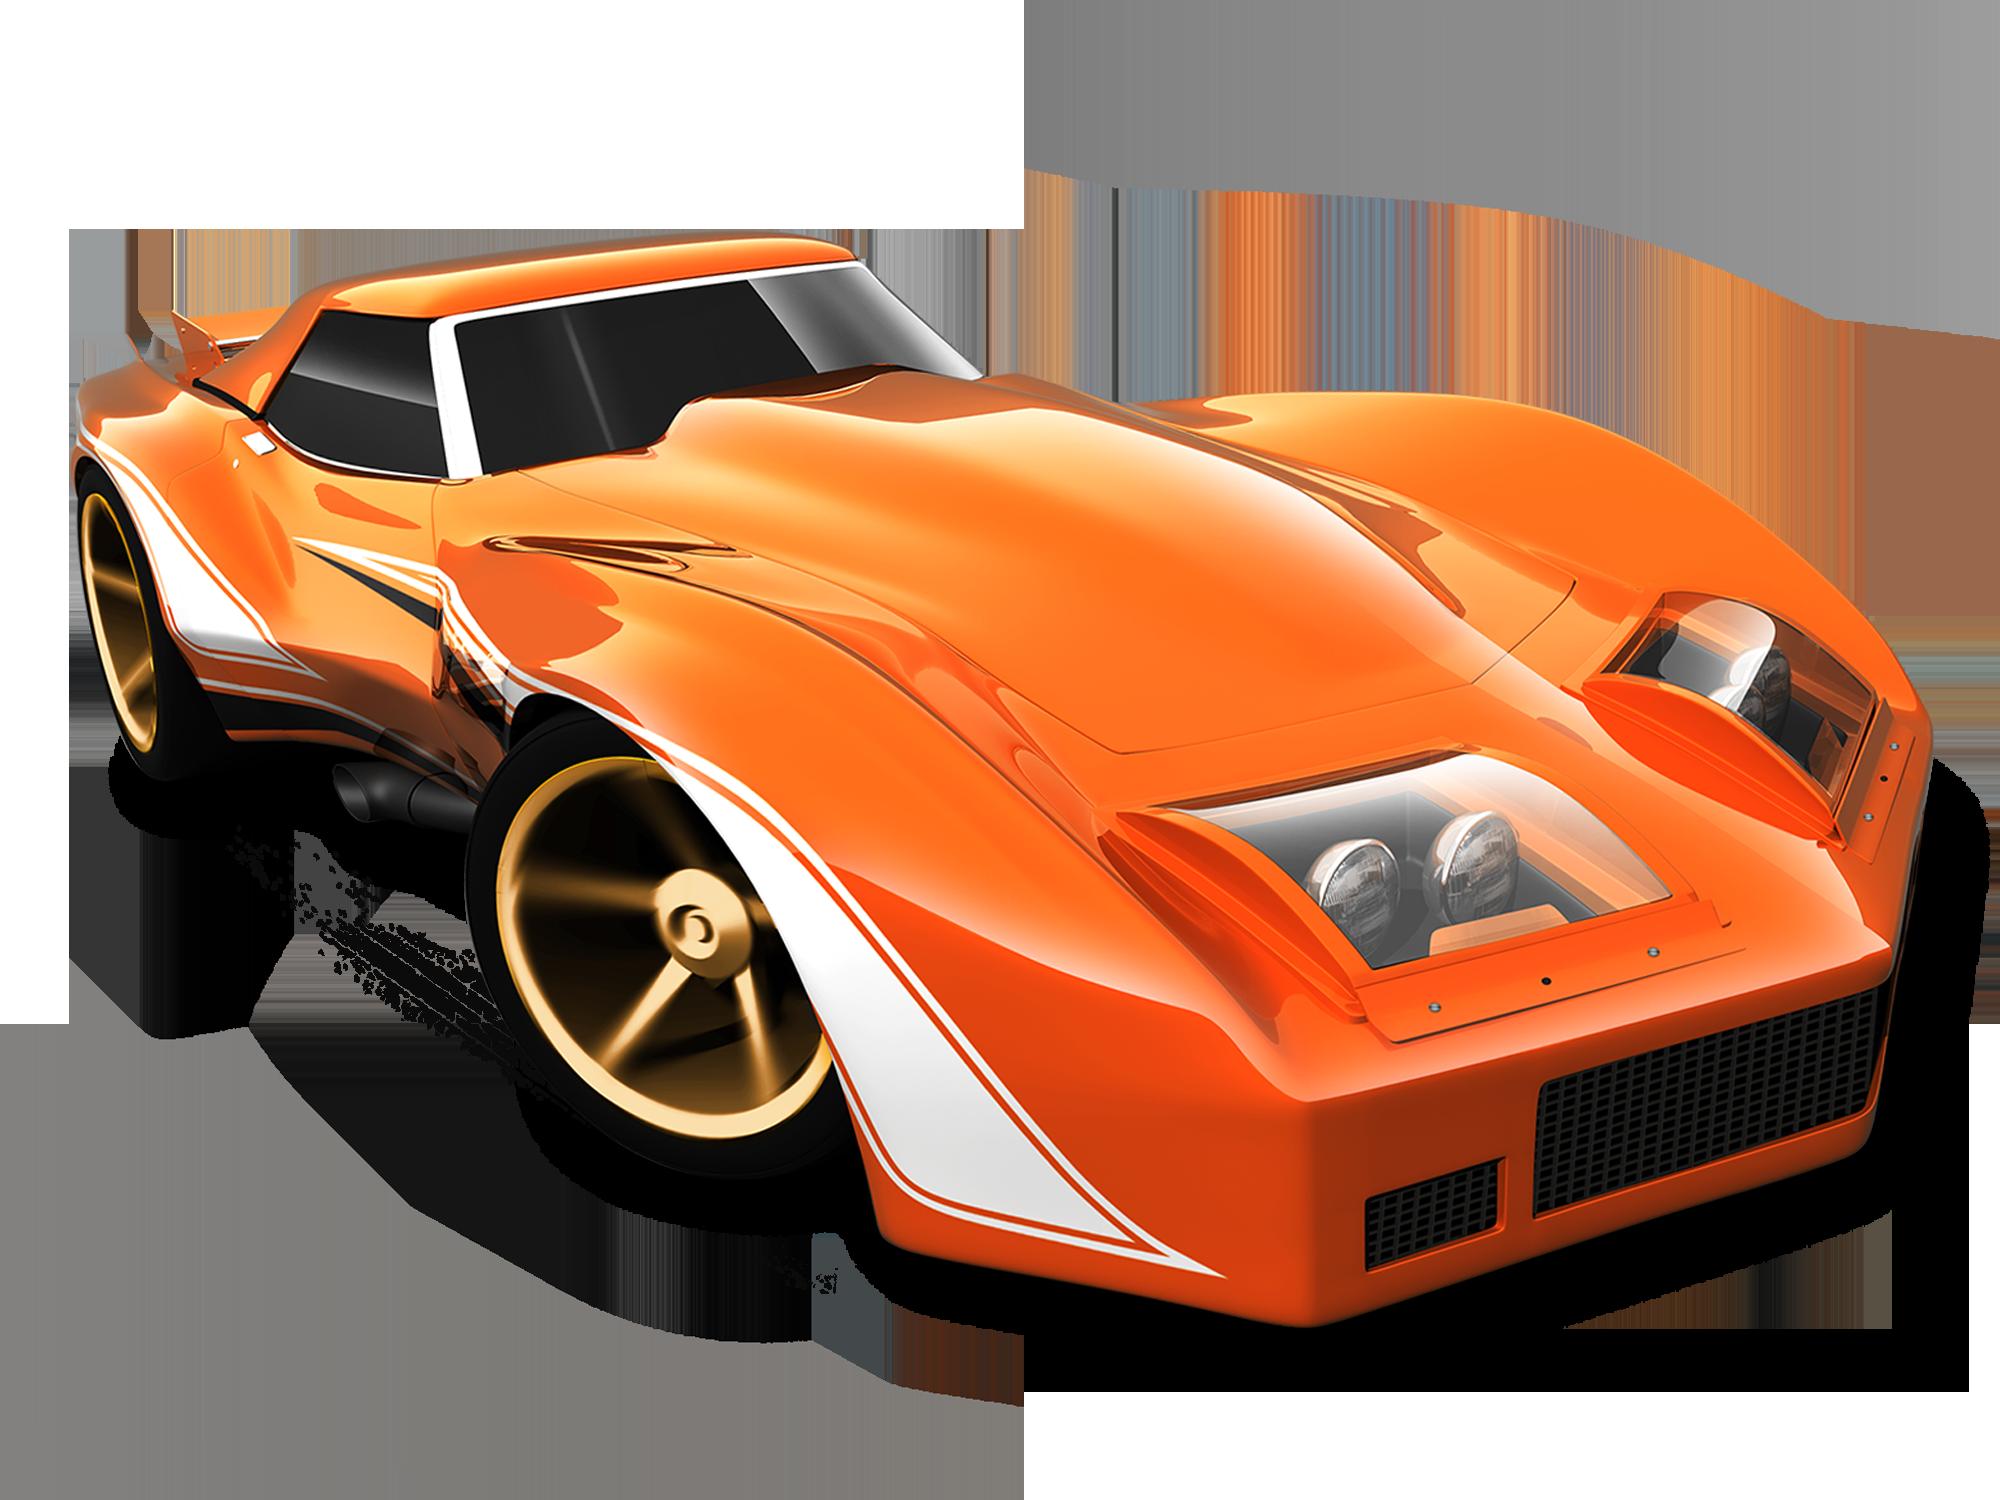 Mattel Hot Wheels Diecast Car 76 Greenwood Corvette 2014 Orange Carros Veiculos Desenhos